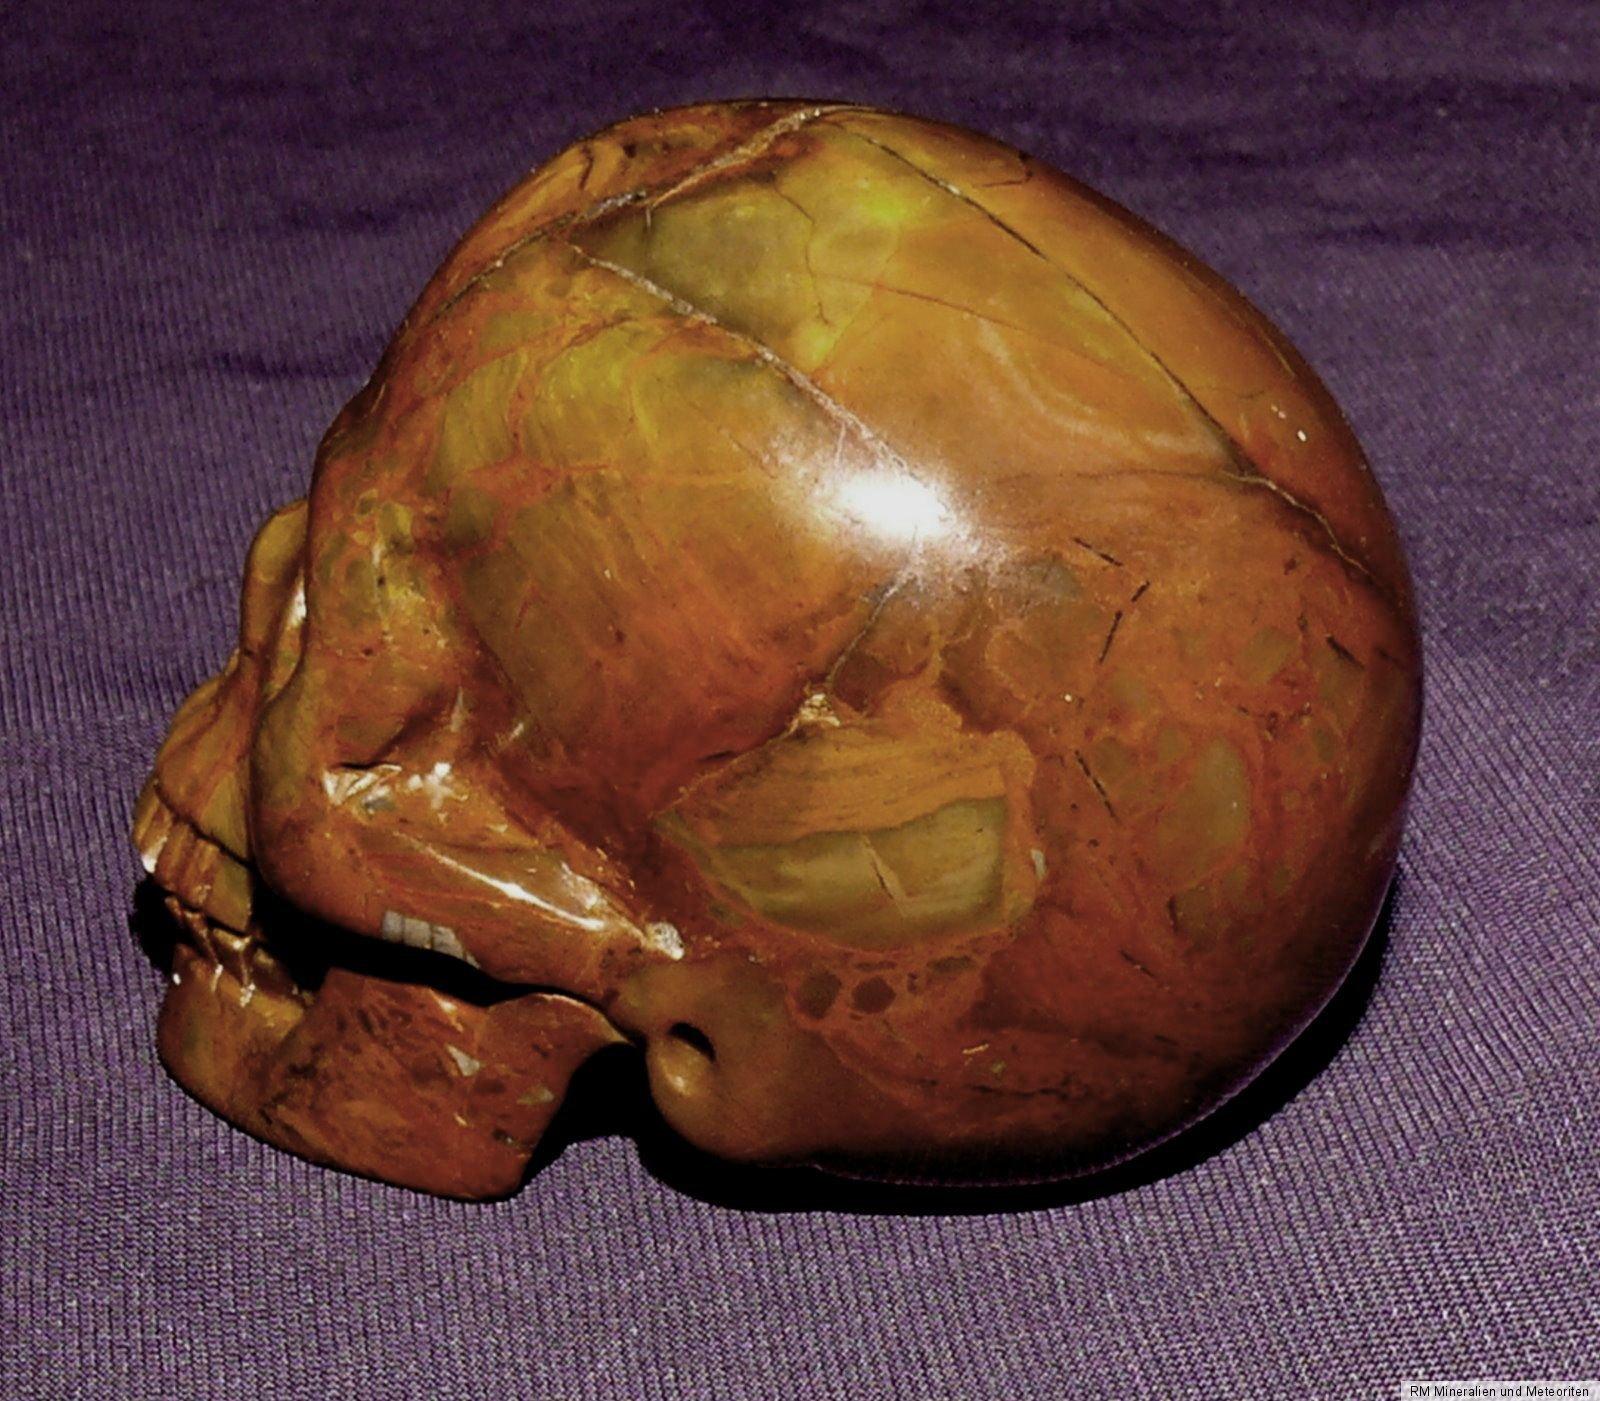 naturgetreuer edelsteinsch del skull gelber leaves achat 94 0g 51x41x34mm ebay. Black Bedroom Furniture Sets. Home Design Ideas